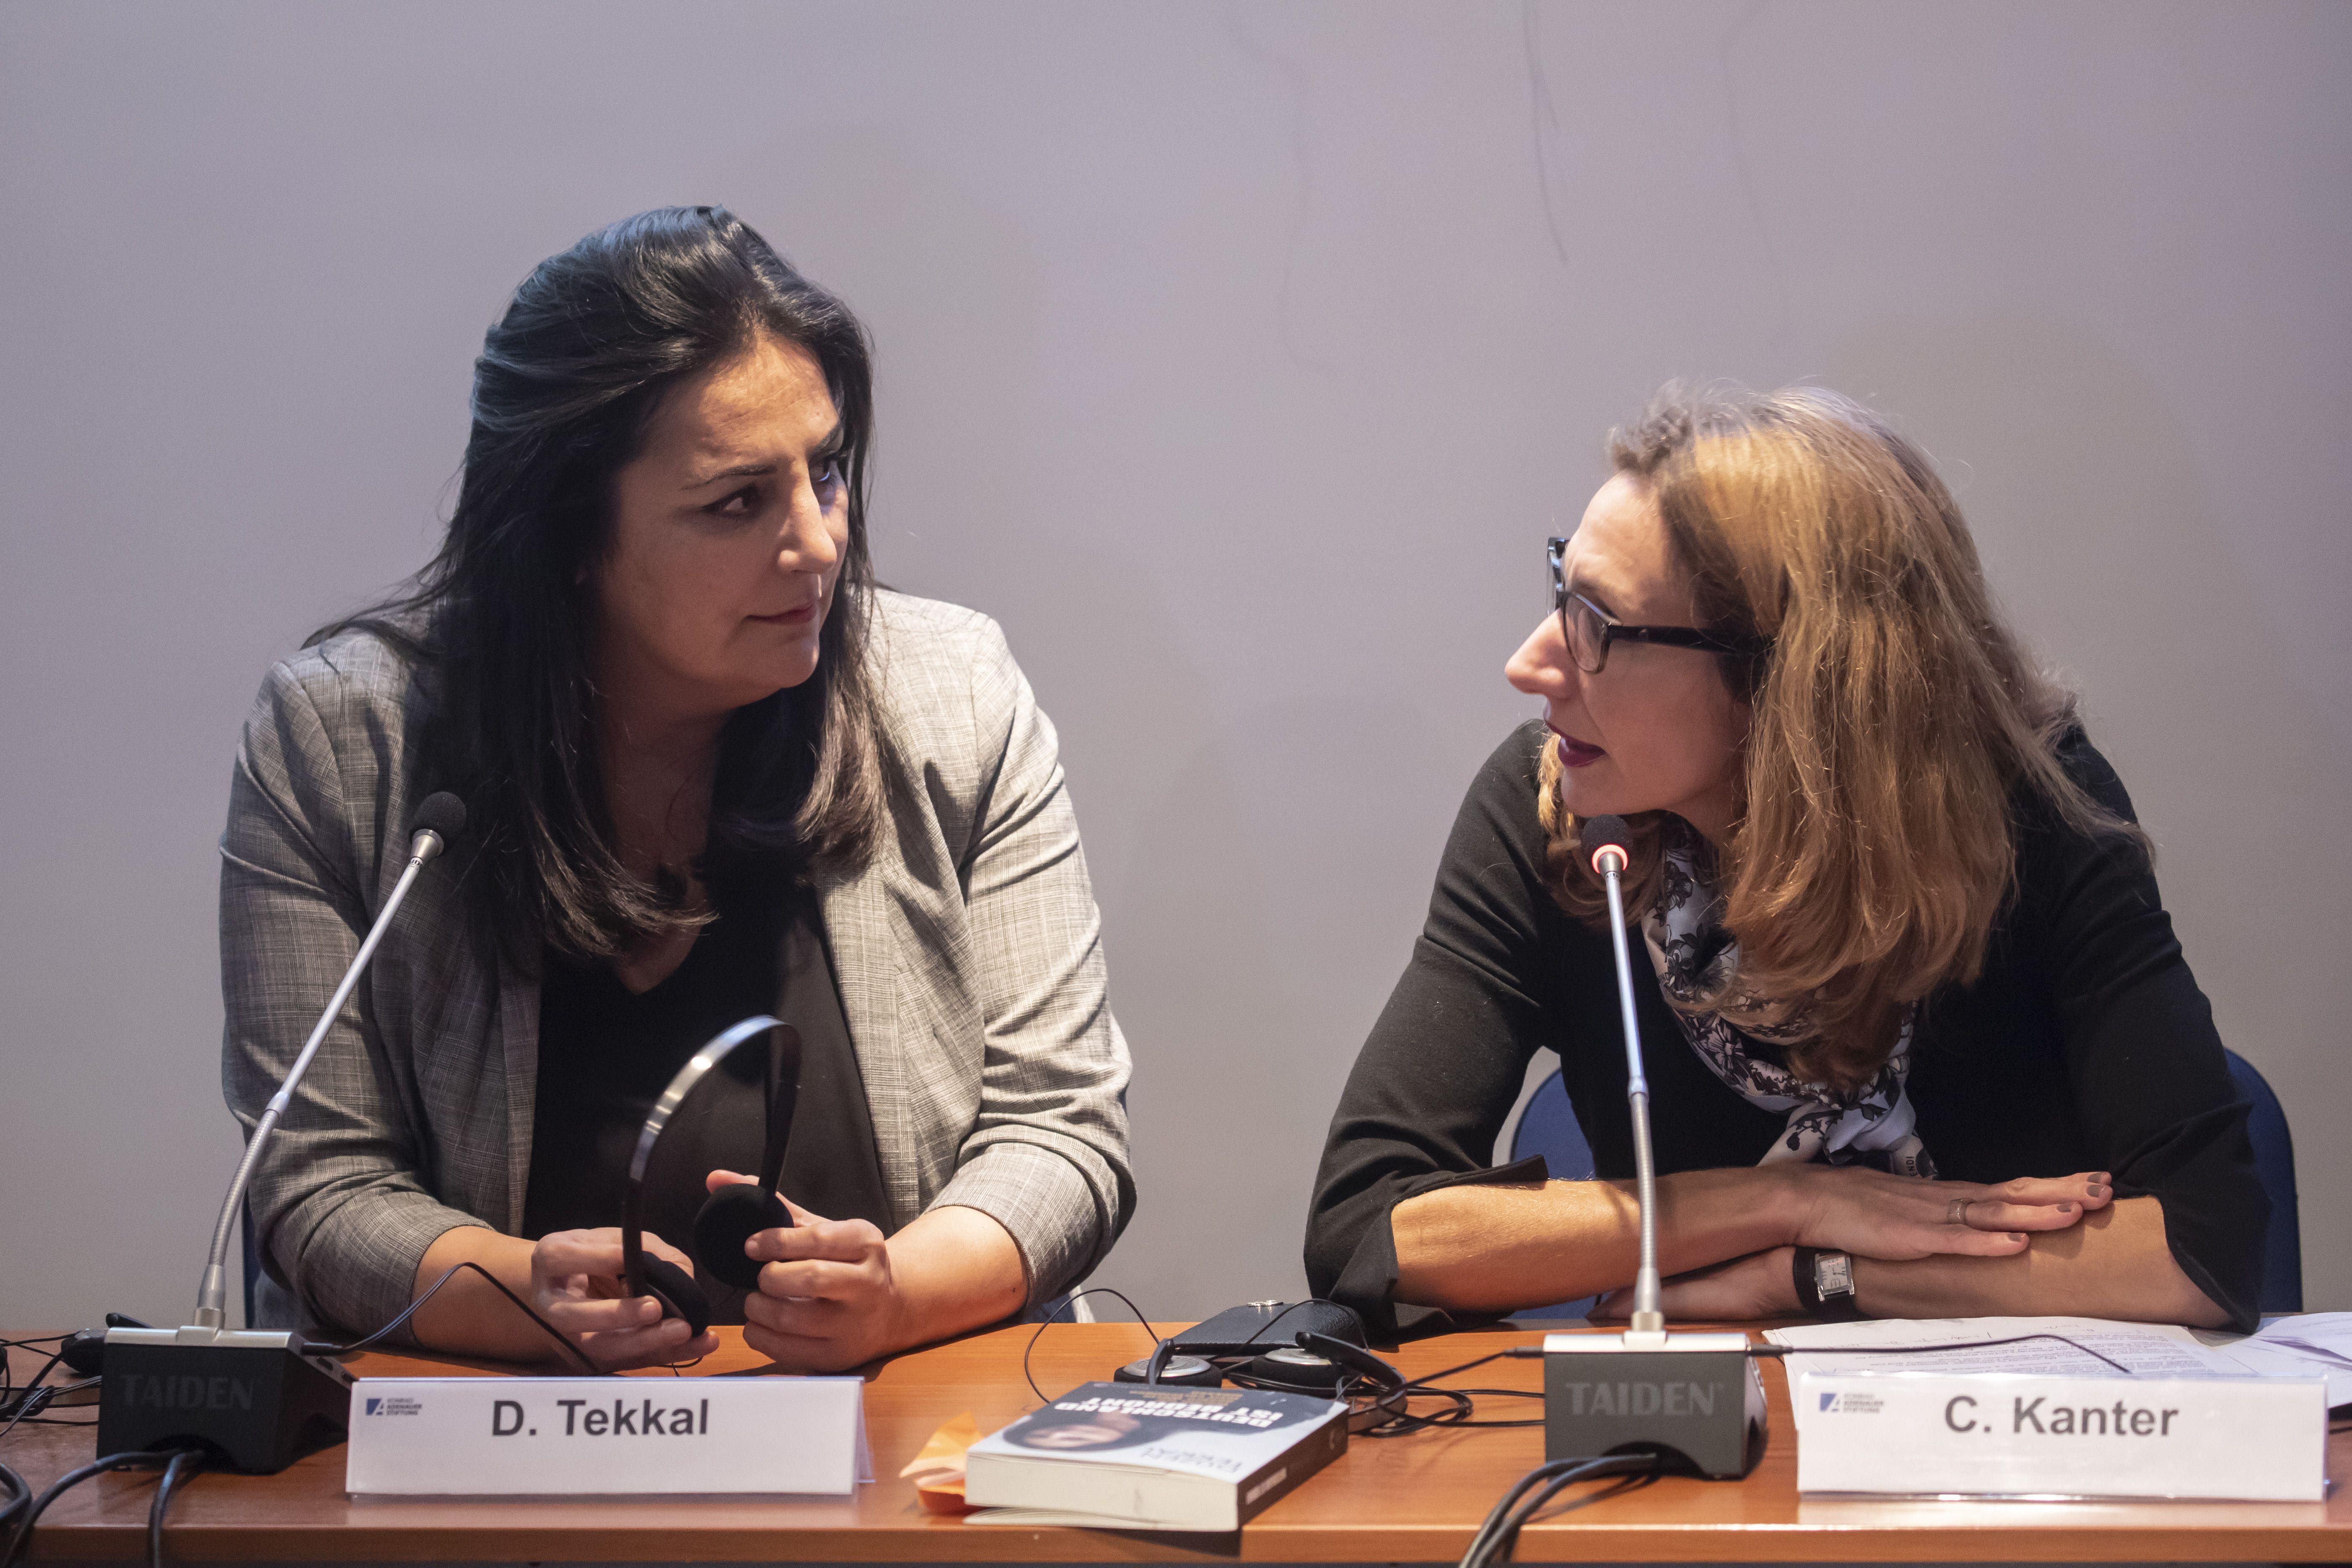 Roma, 27-11-2018. Konrad-Adenauer-Stiftung. L'incontro con Düzen Tekkal. Copyright: Imago Mundi / Stefano dal Pozzolo